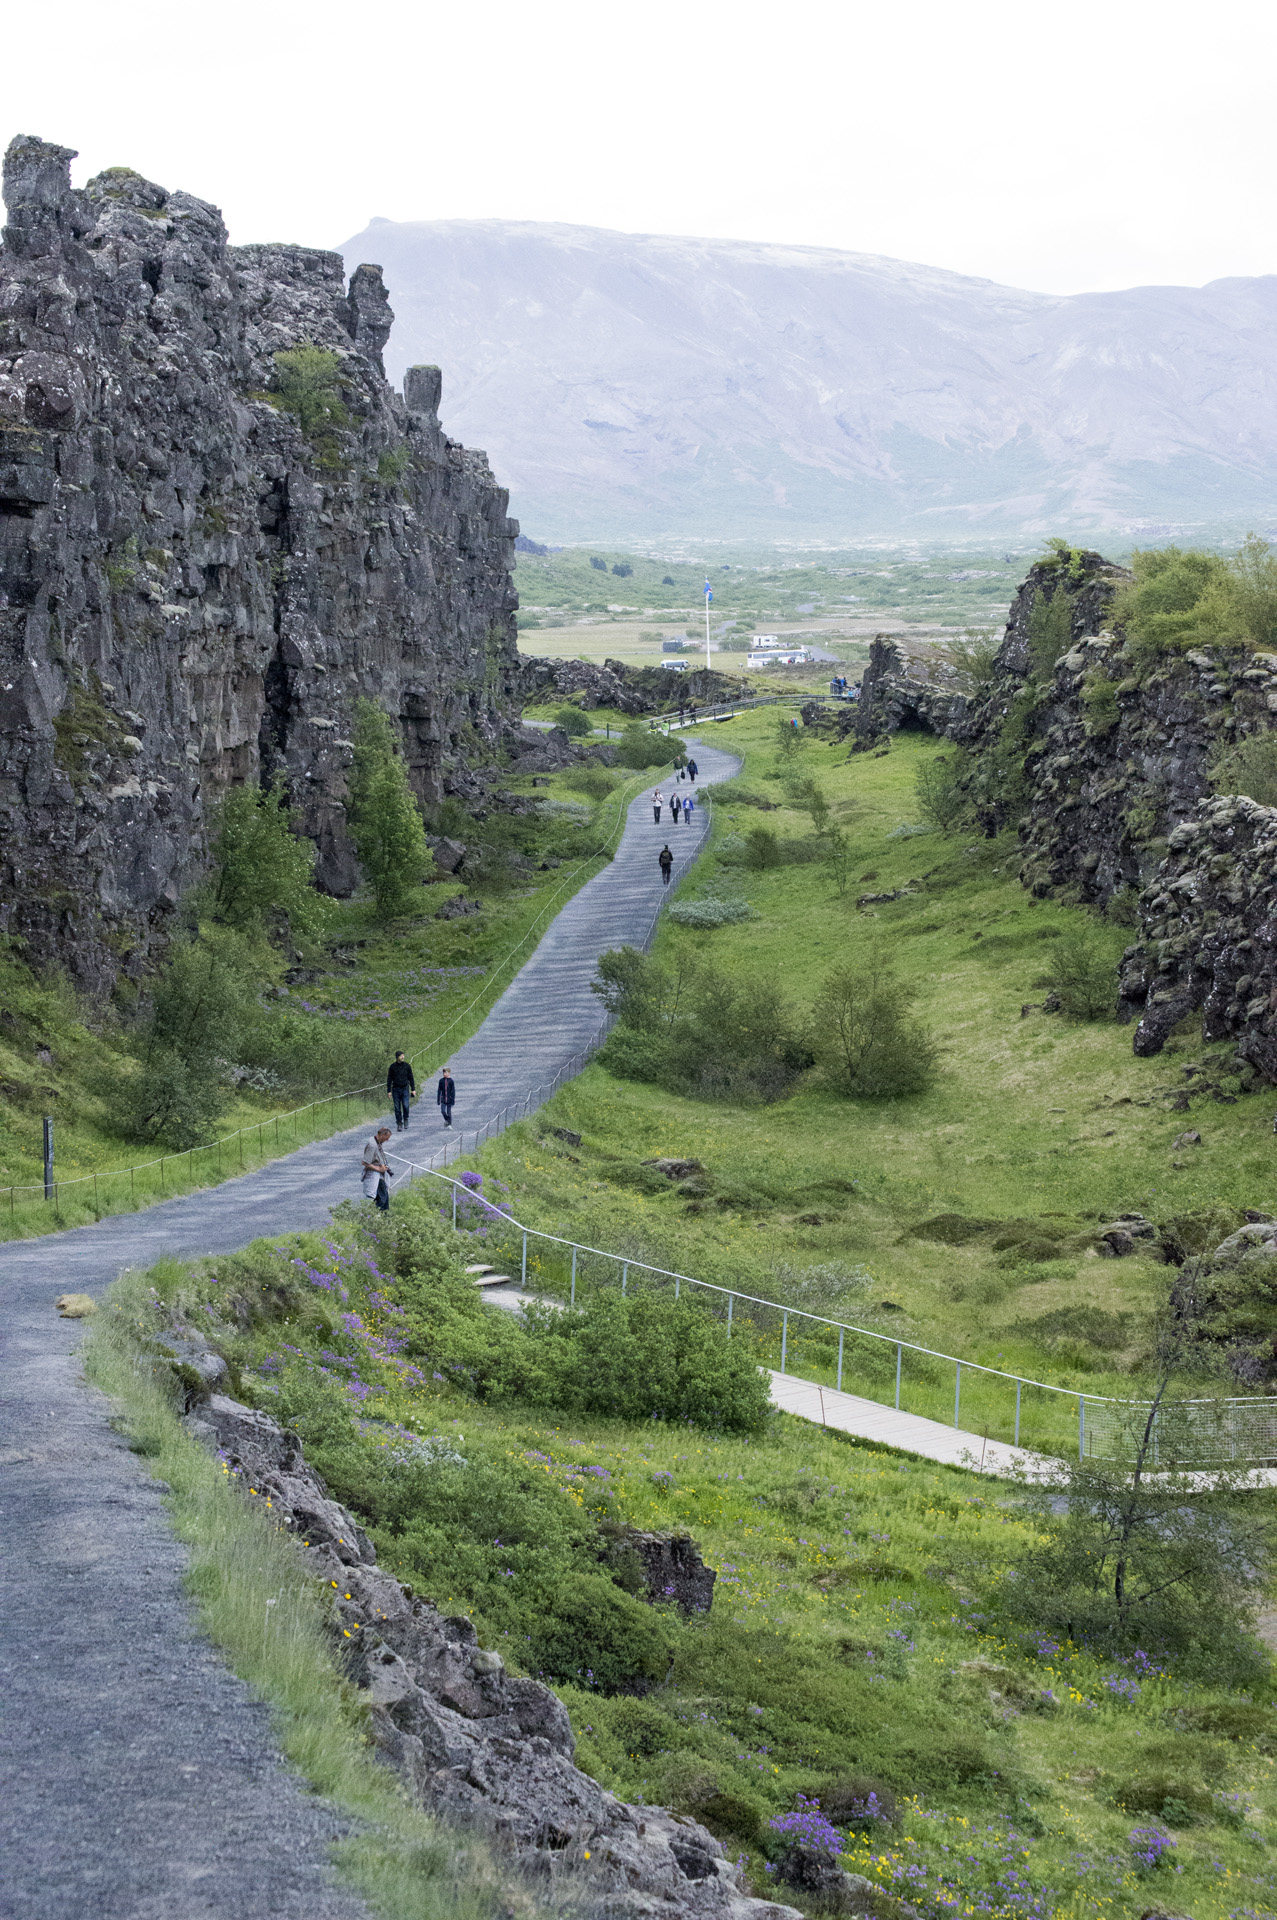 The rift valley along the Mid-Atlantic Ridge between the North American (left) and Eurasian tectonic plates, Þingvellir National Park, Suðurland region, Iceland.